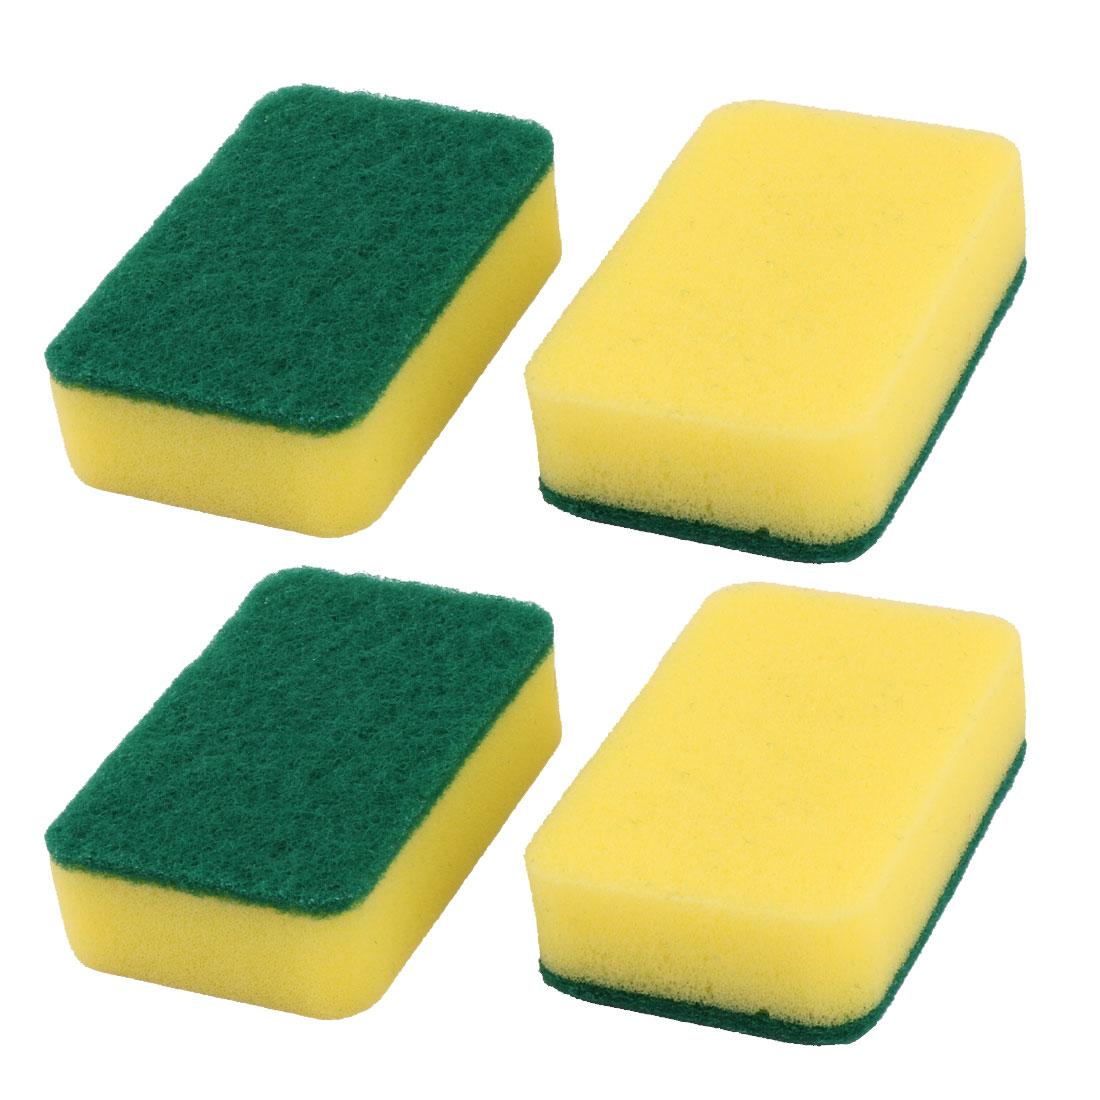 Apartment Dorm Sponge Rectangle Dish Plate Pan Stockpot Cleaning Scrubber Pad 4 Pcs